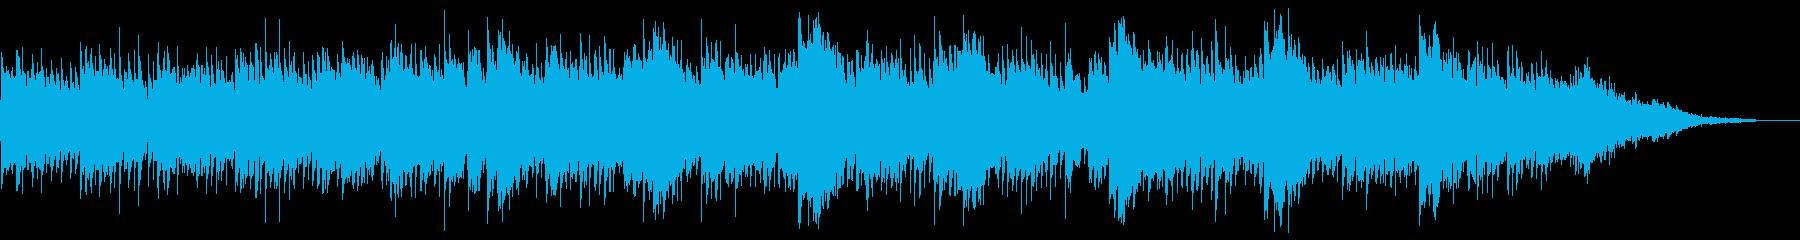 Fabric Noiseの再生済みの波形